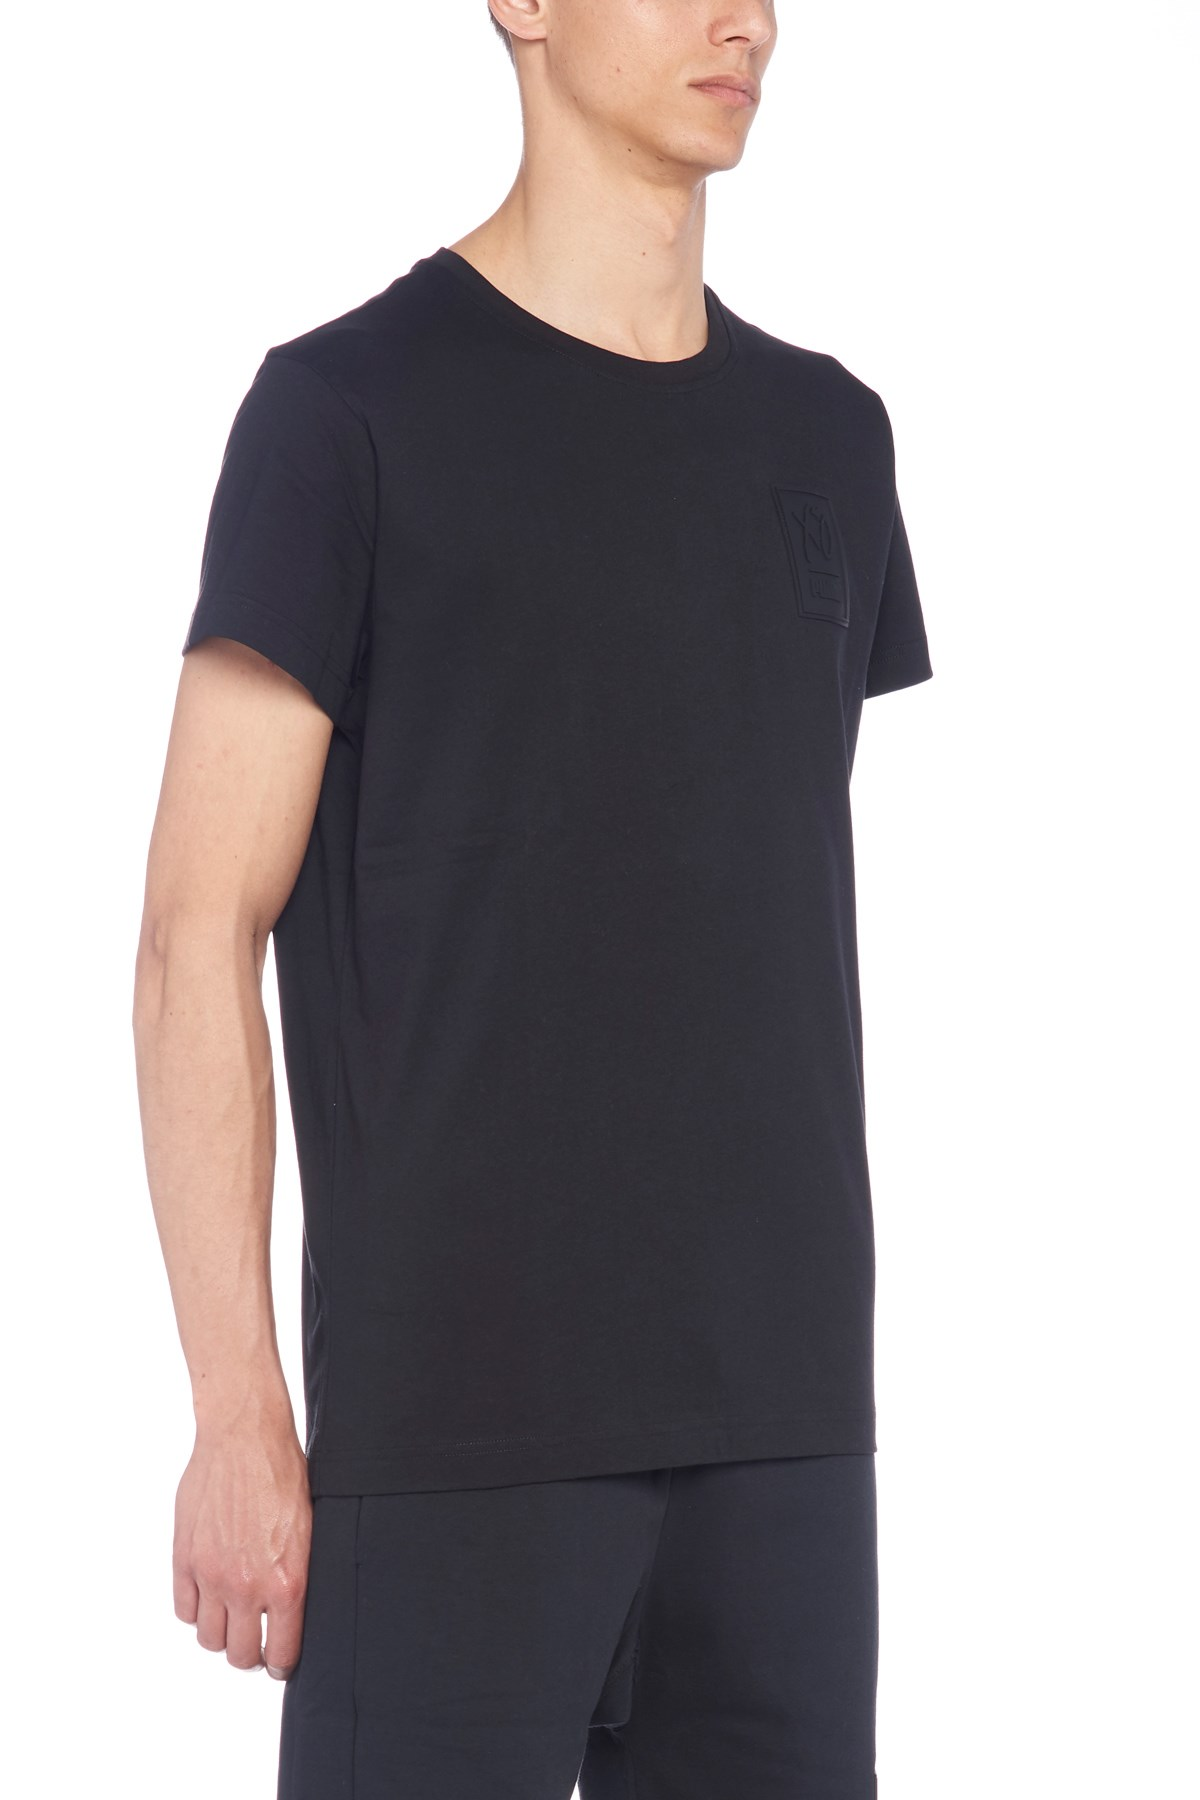 58e8e9fe0c1 ... puma x xo printed t shirt available on julian fashion com 52043